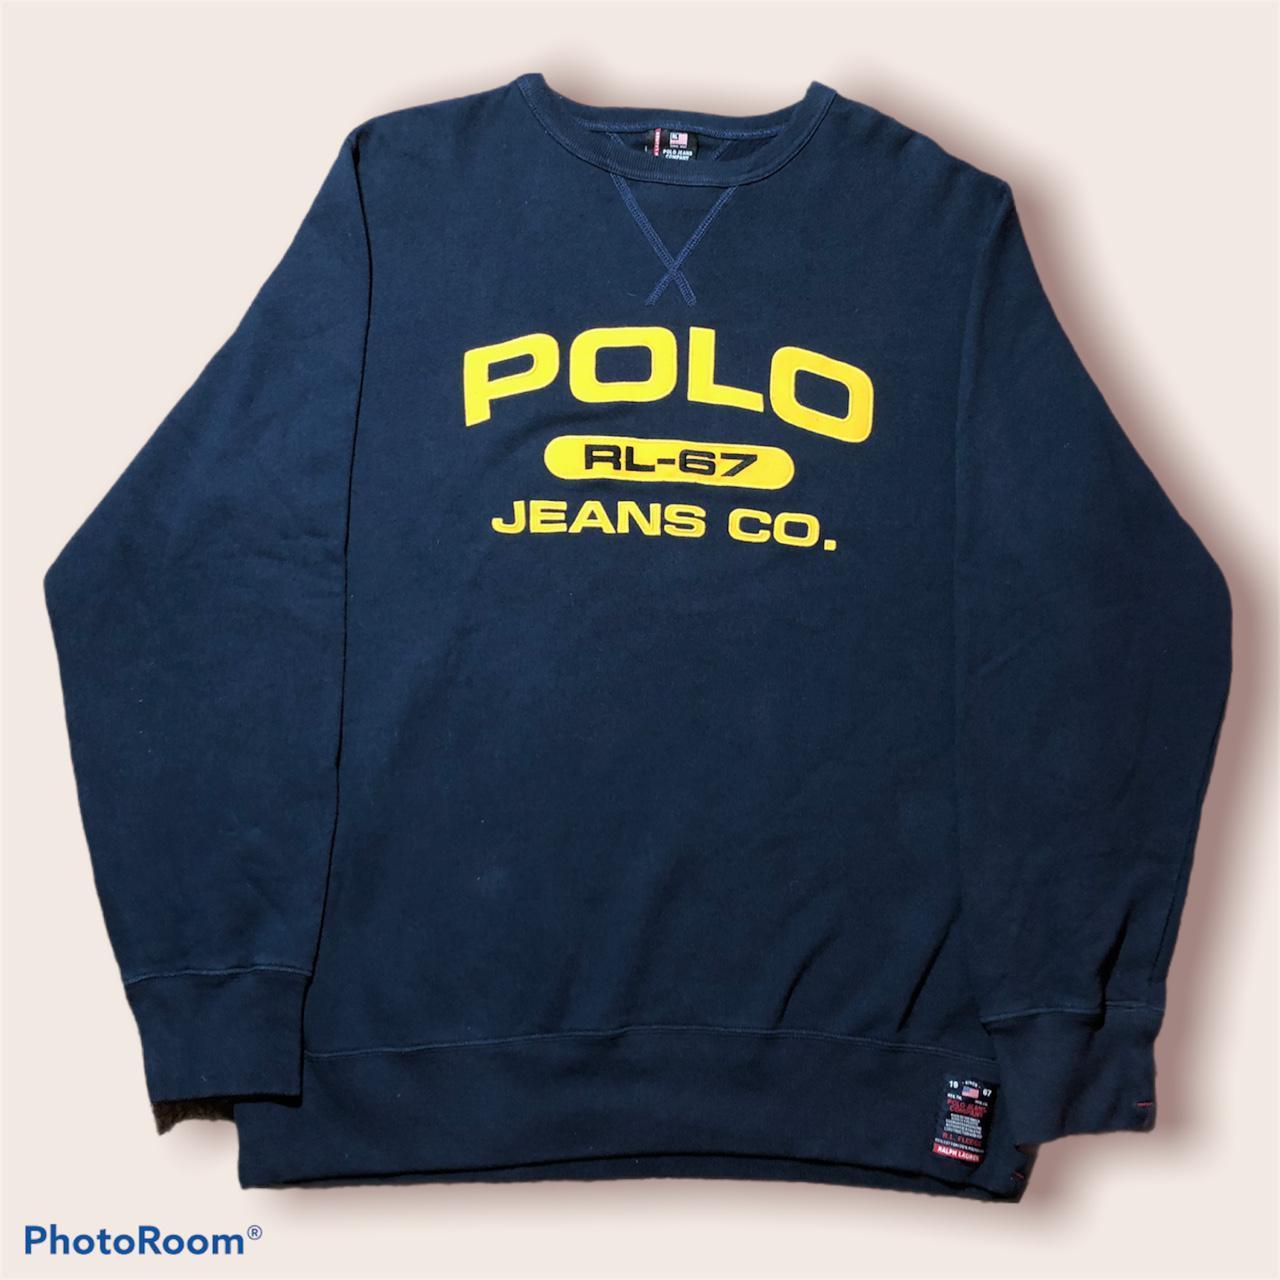 Product Image 1 - Vintage Polo Jeans Co Crewneck